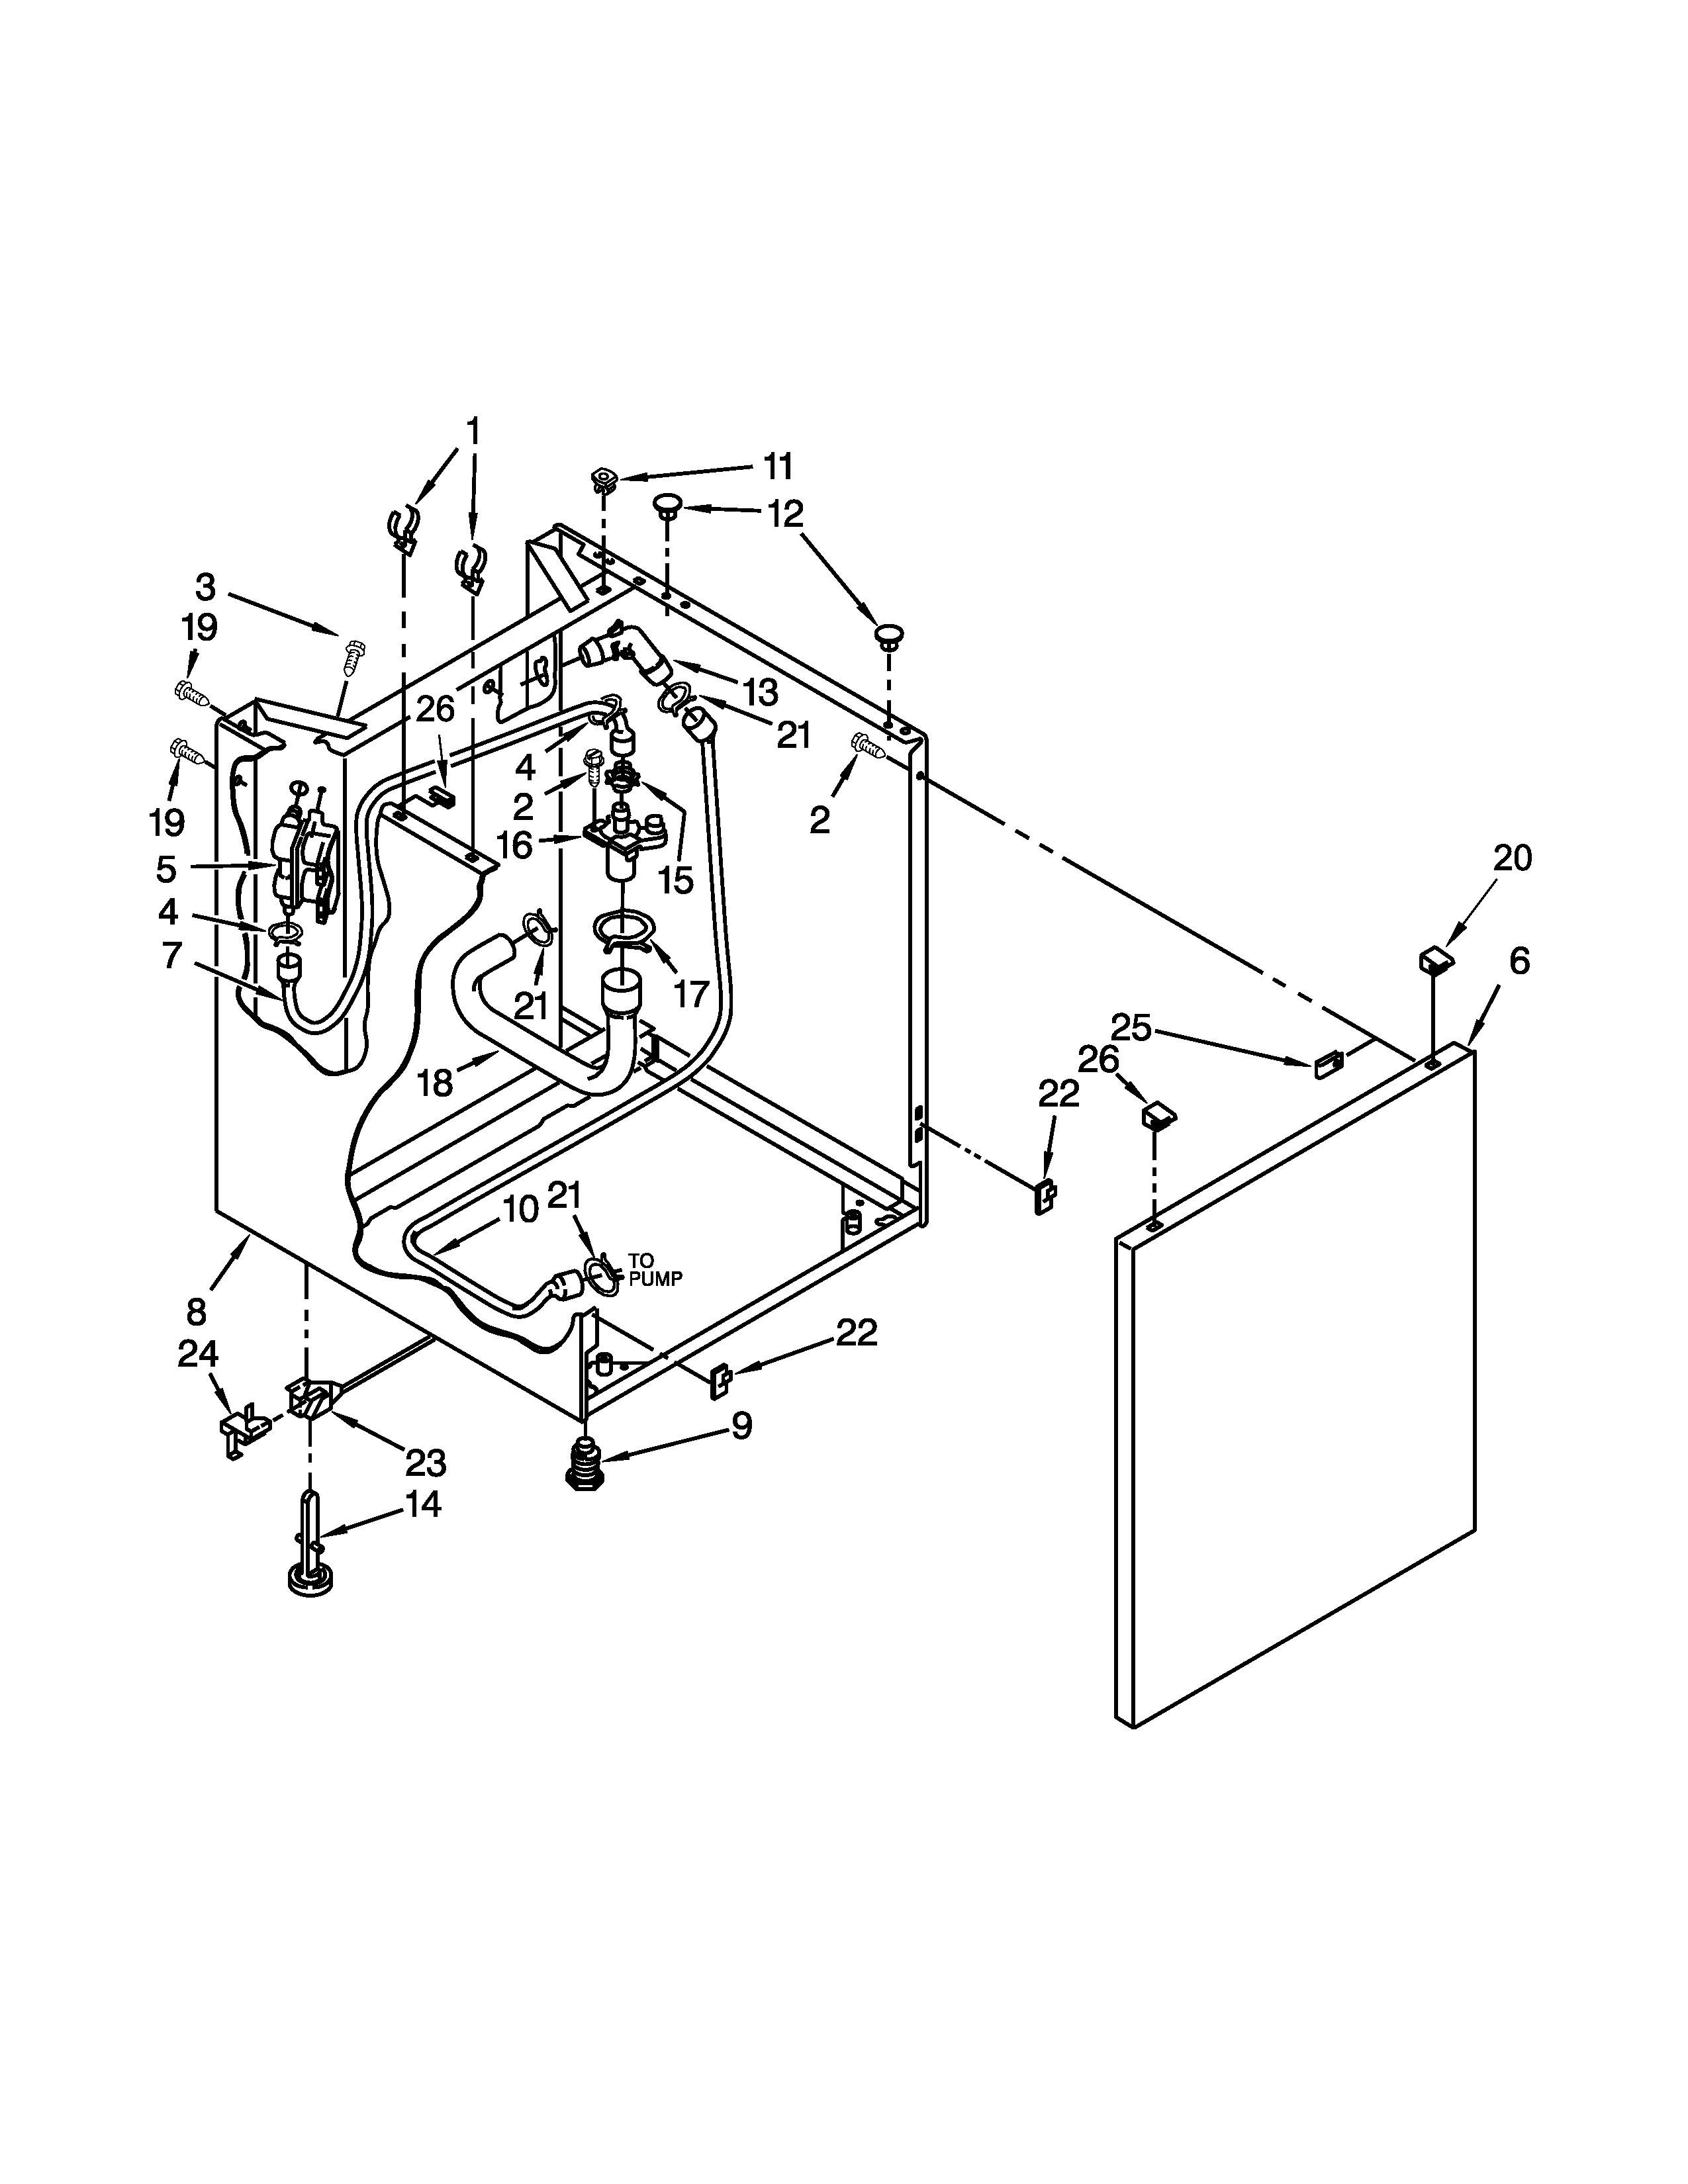 simpsons sears washing machine manual model 110